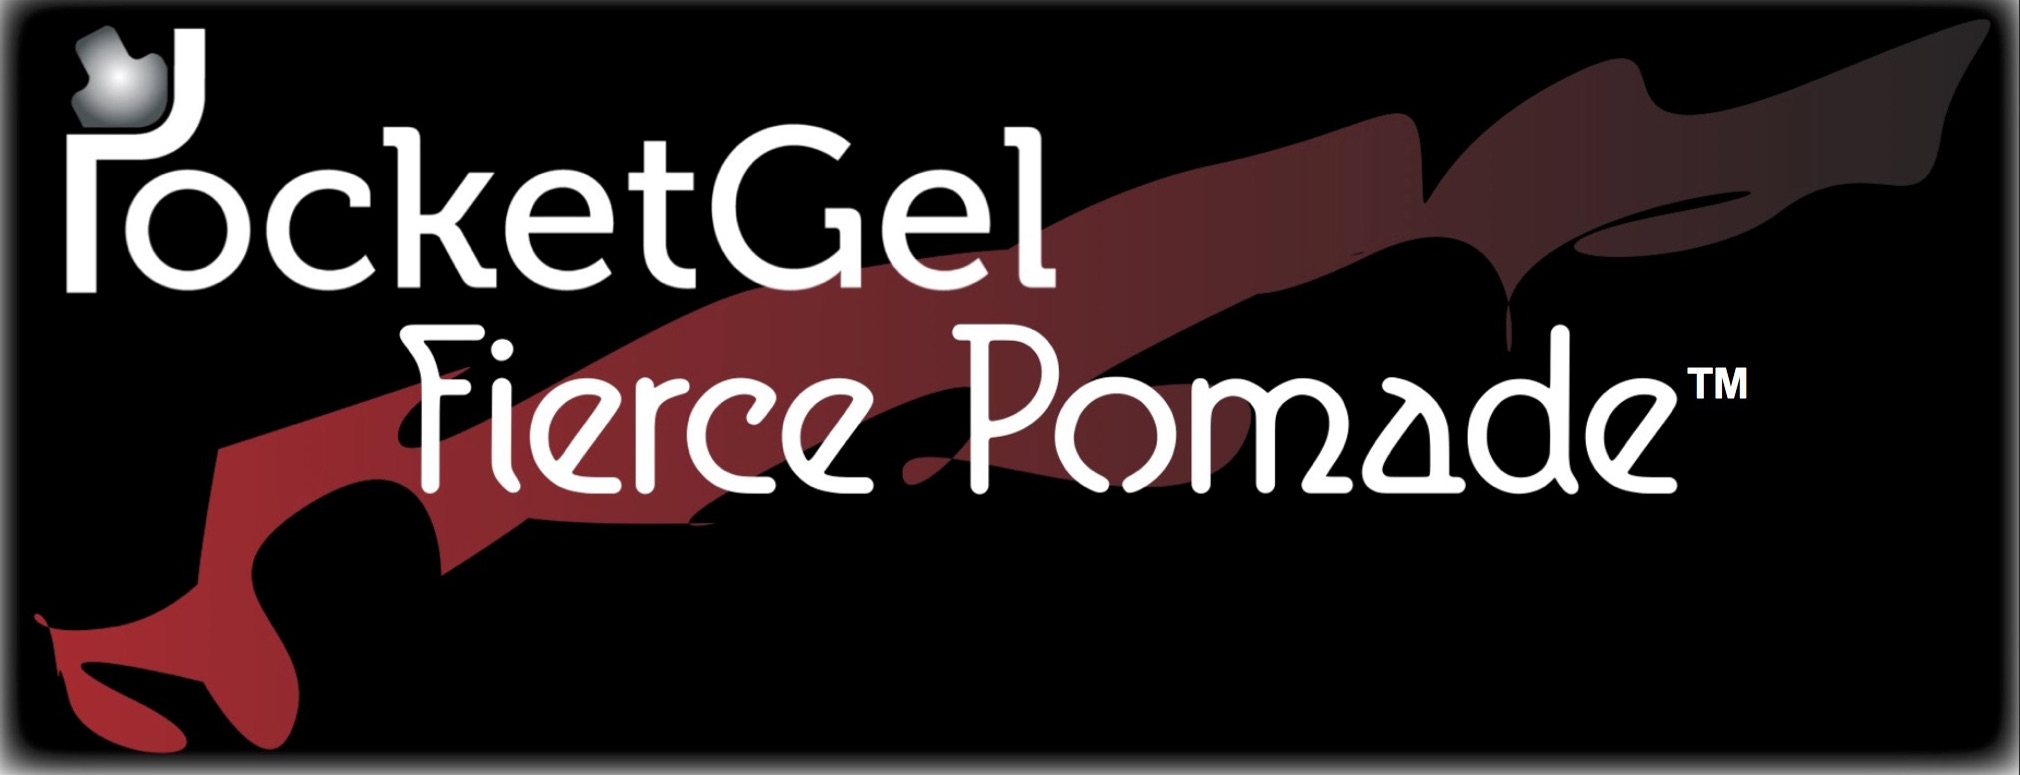 PocketGel Fierce Pomade